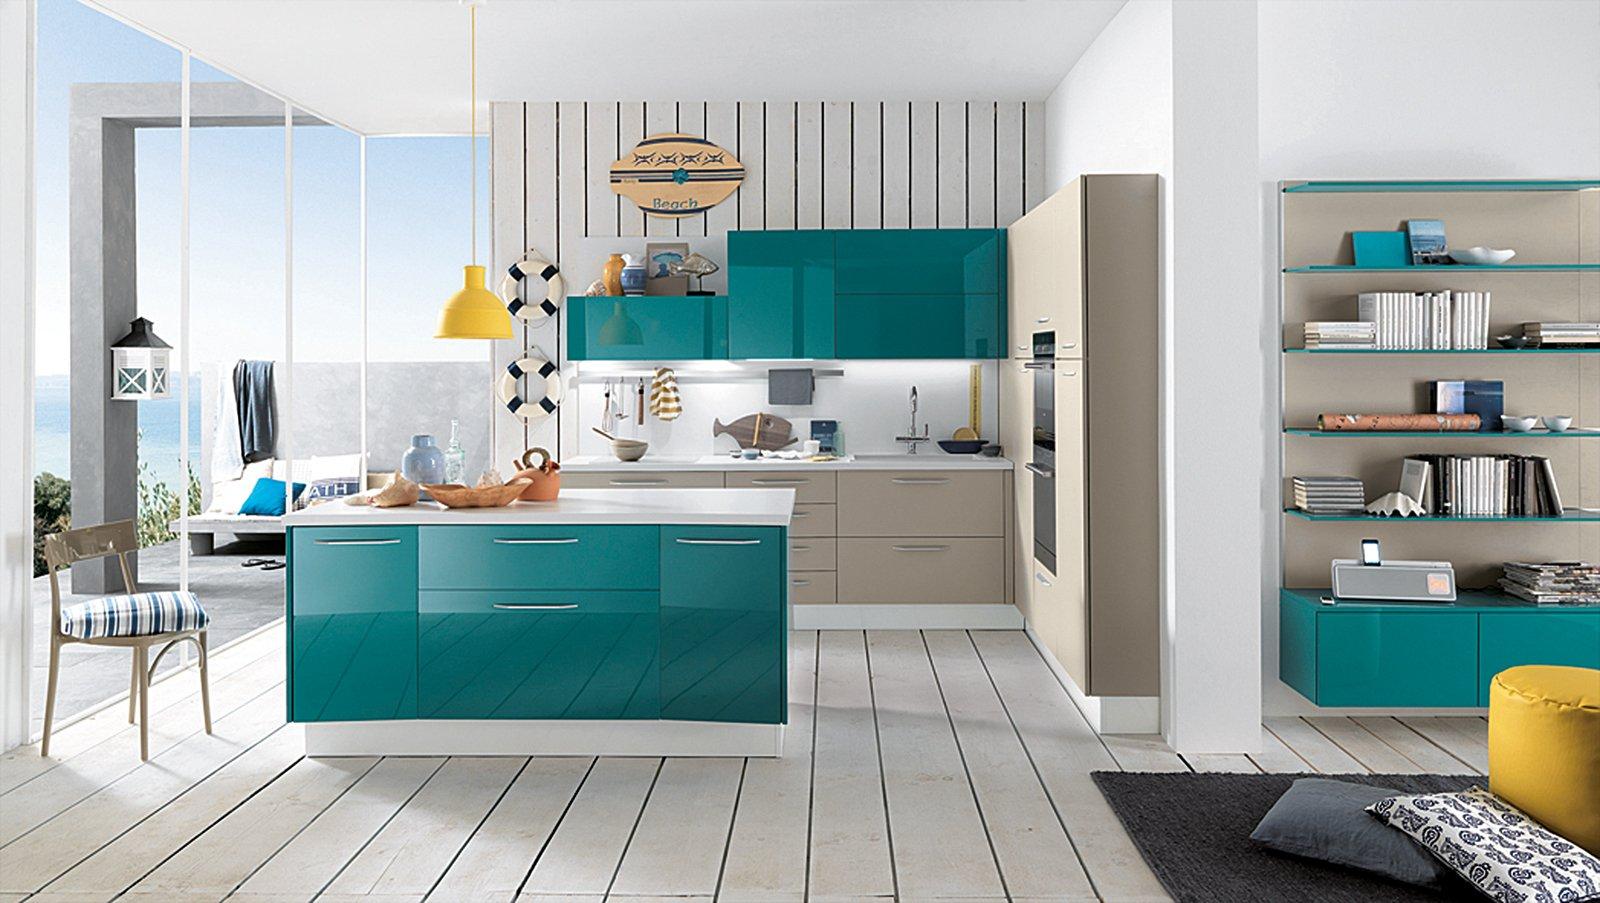 La cucina colorata un guizzo di vitalit cose di casa - Cucine moderne colorate ...